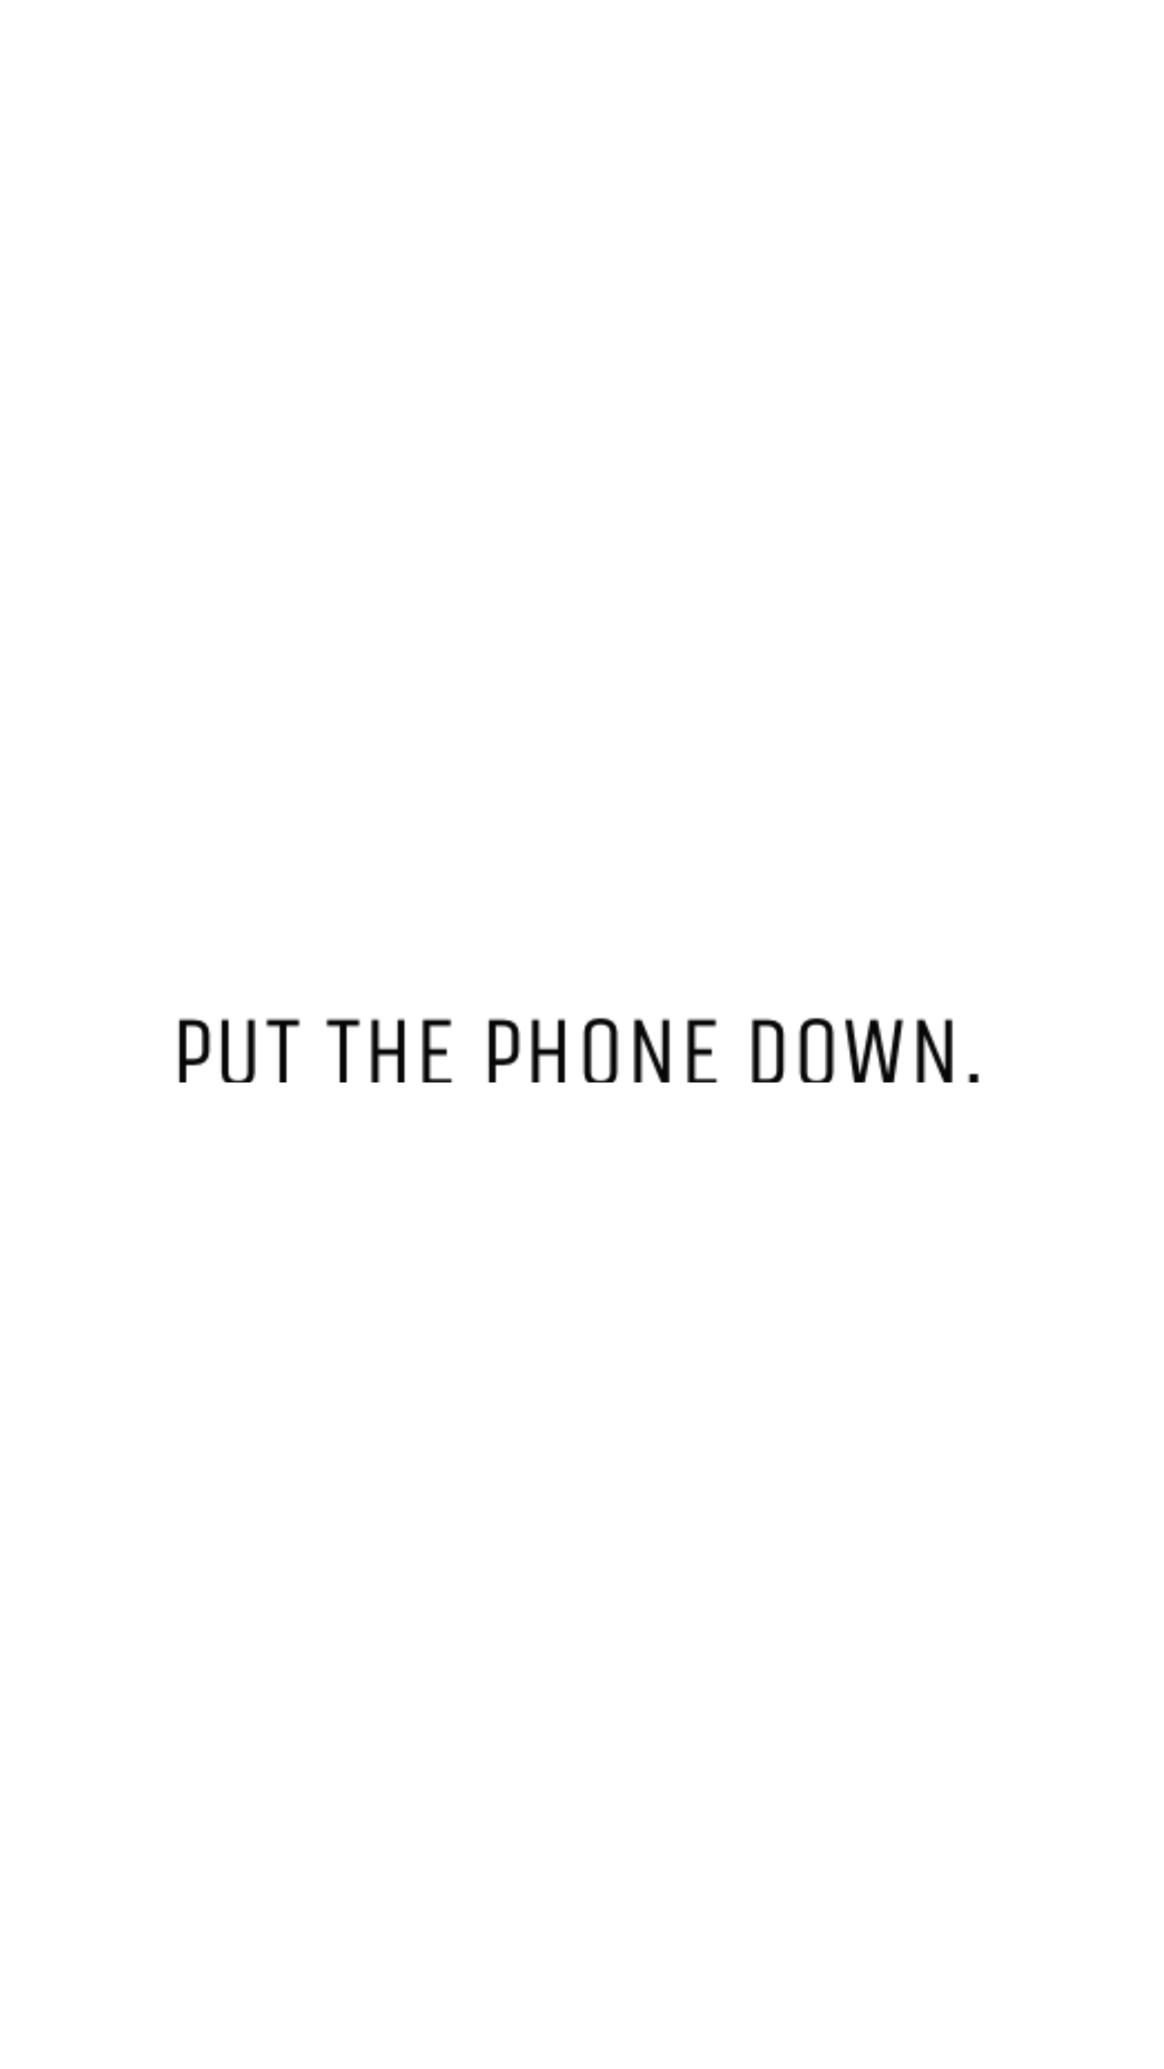 Free Minimal Phone Wallpaper